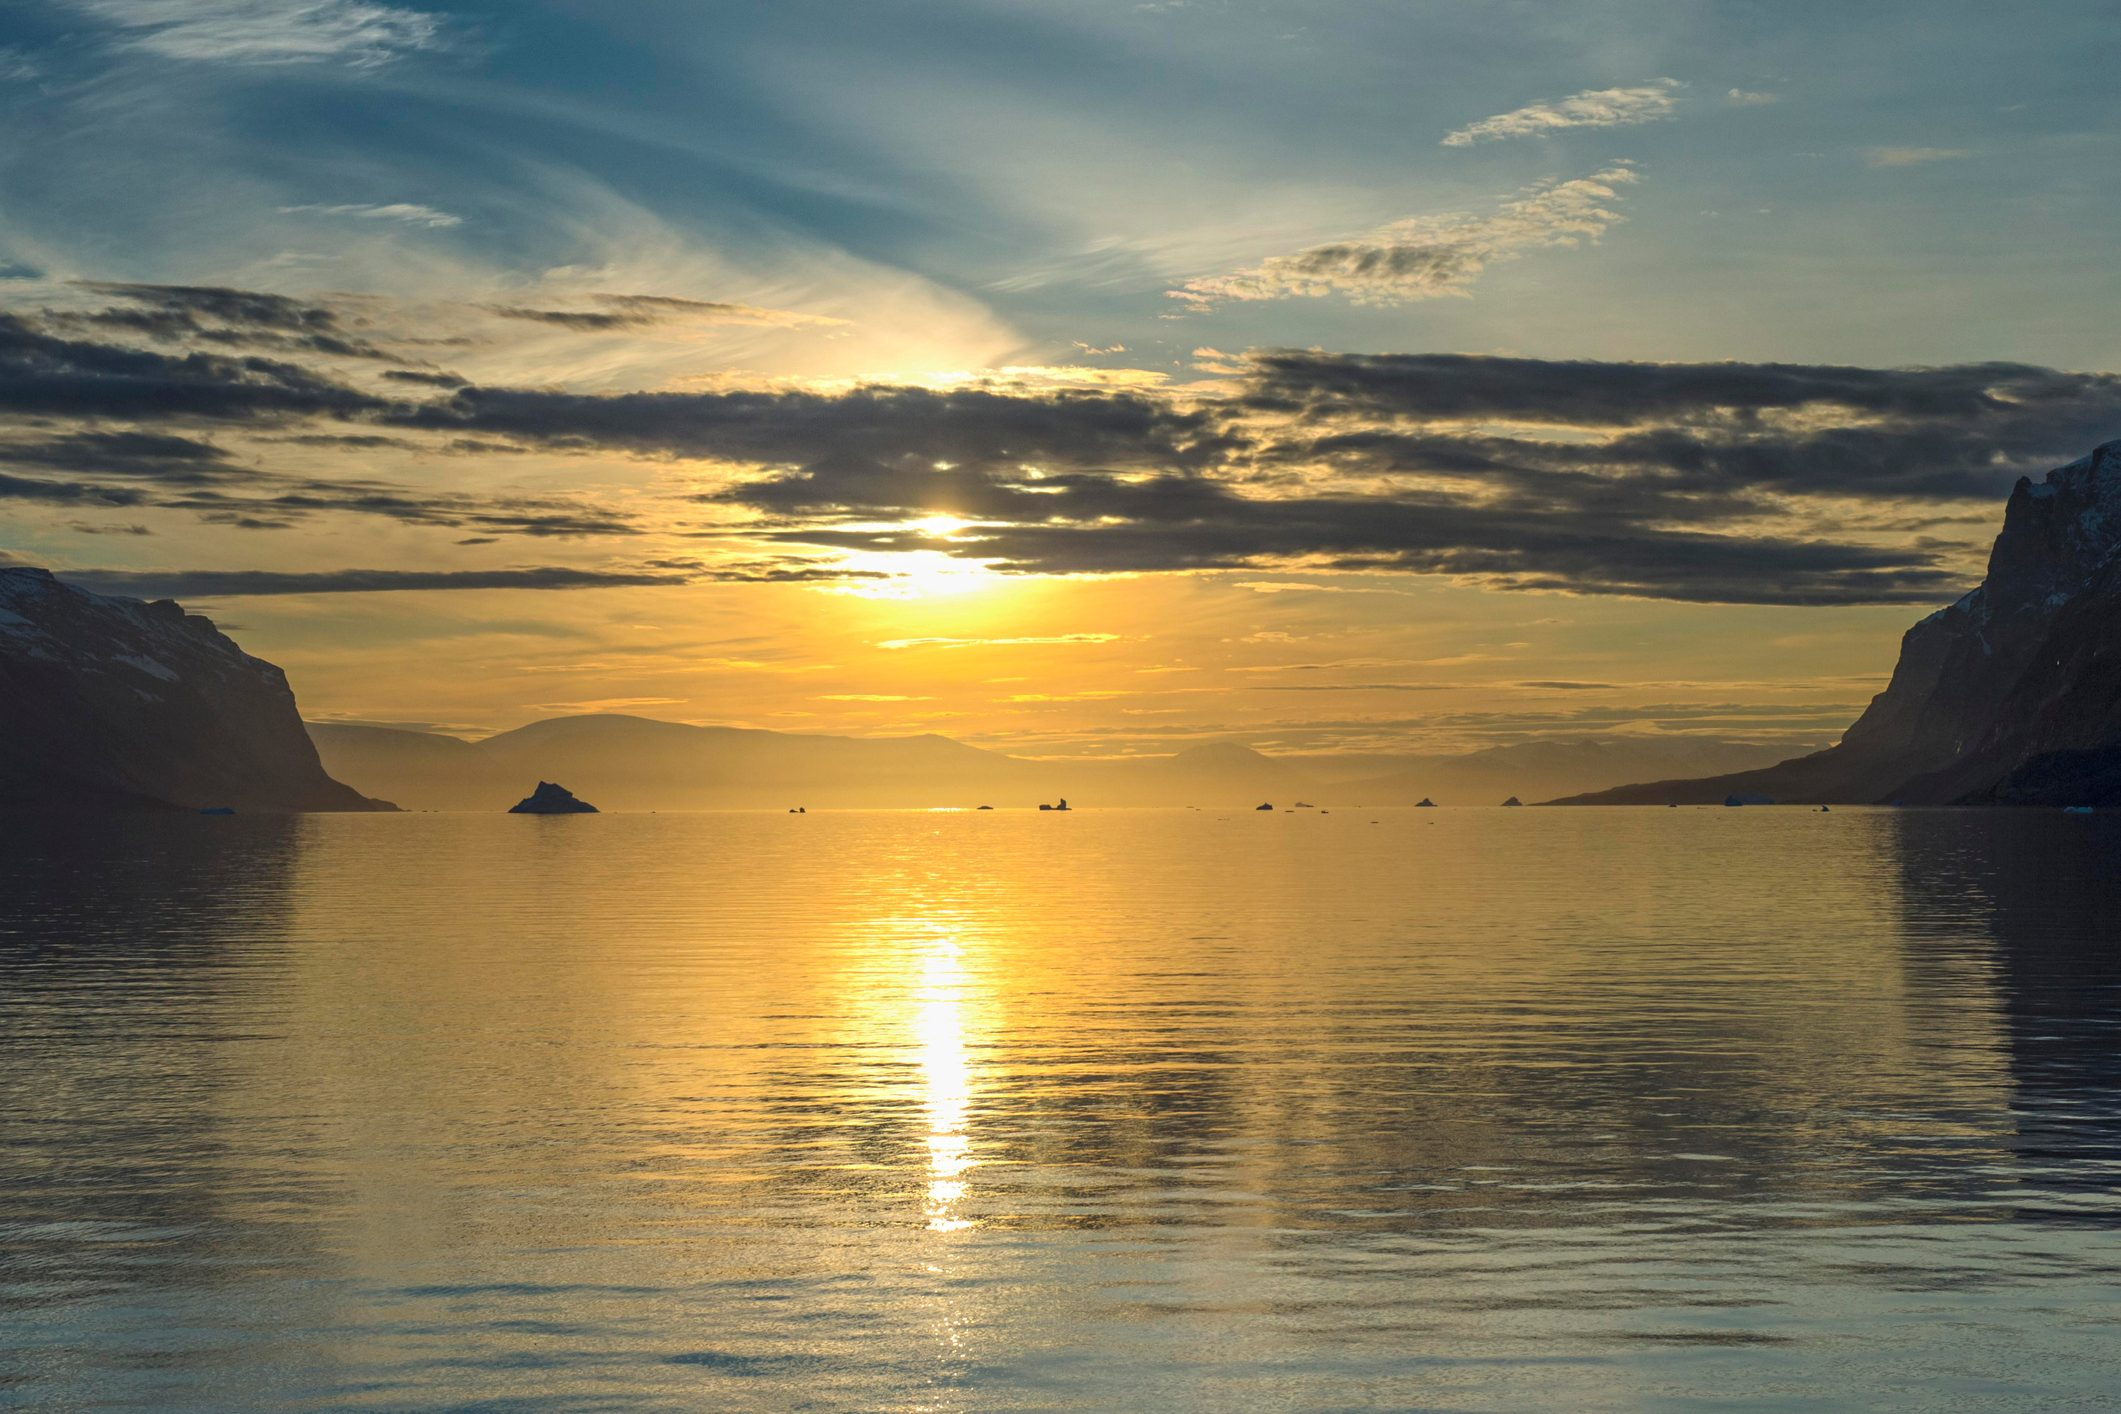 Sunrise, icebergs, Kejser Franz Joseph Fjord, Northeast Greenland National Park, Greenland